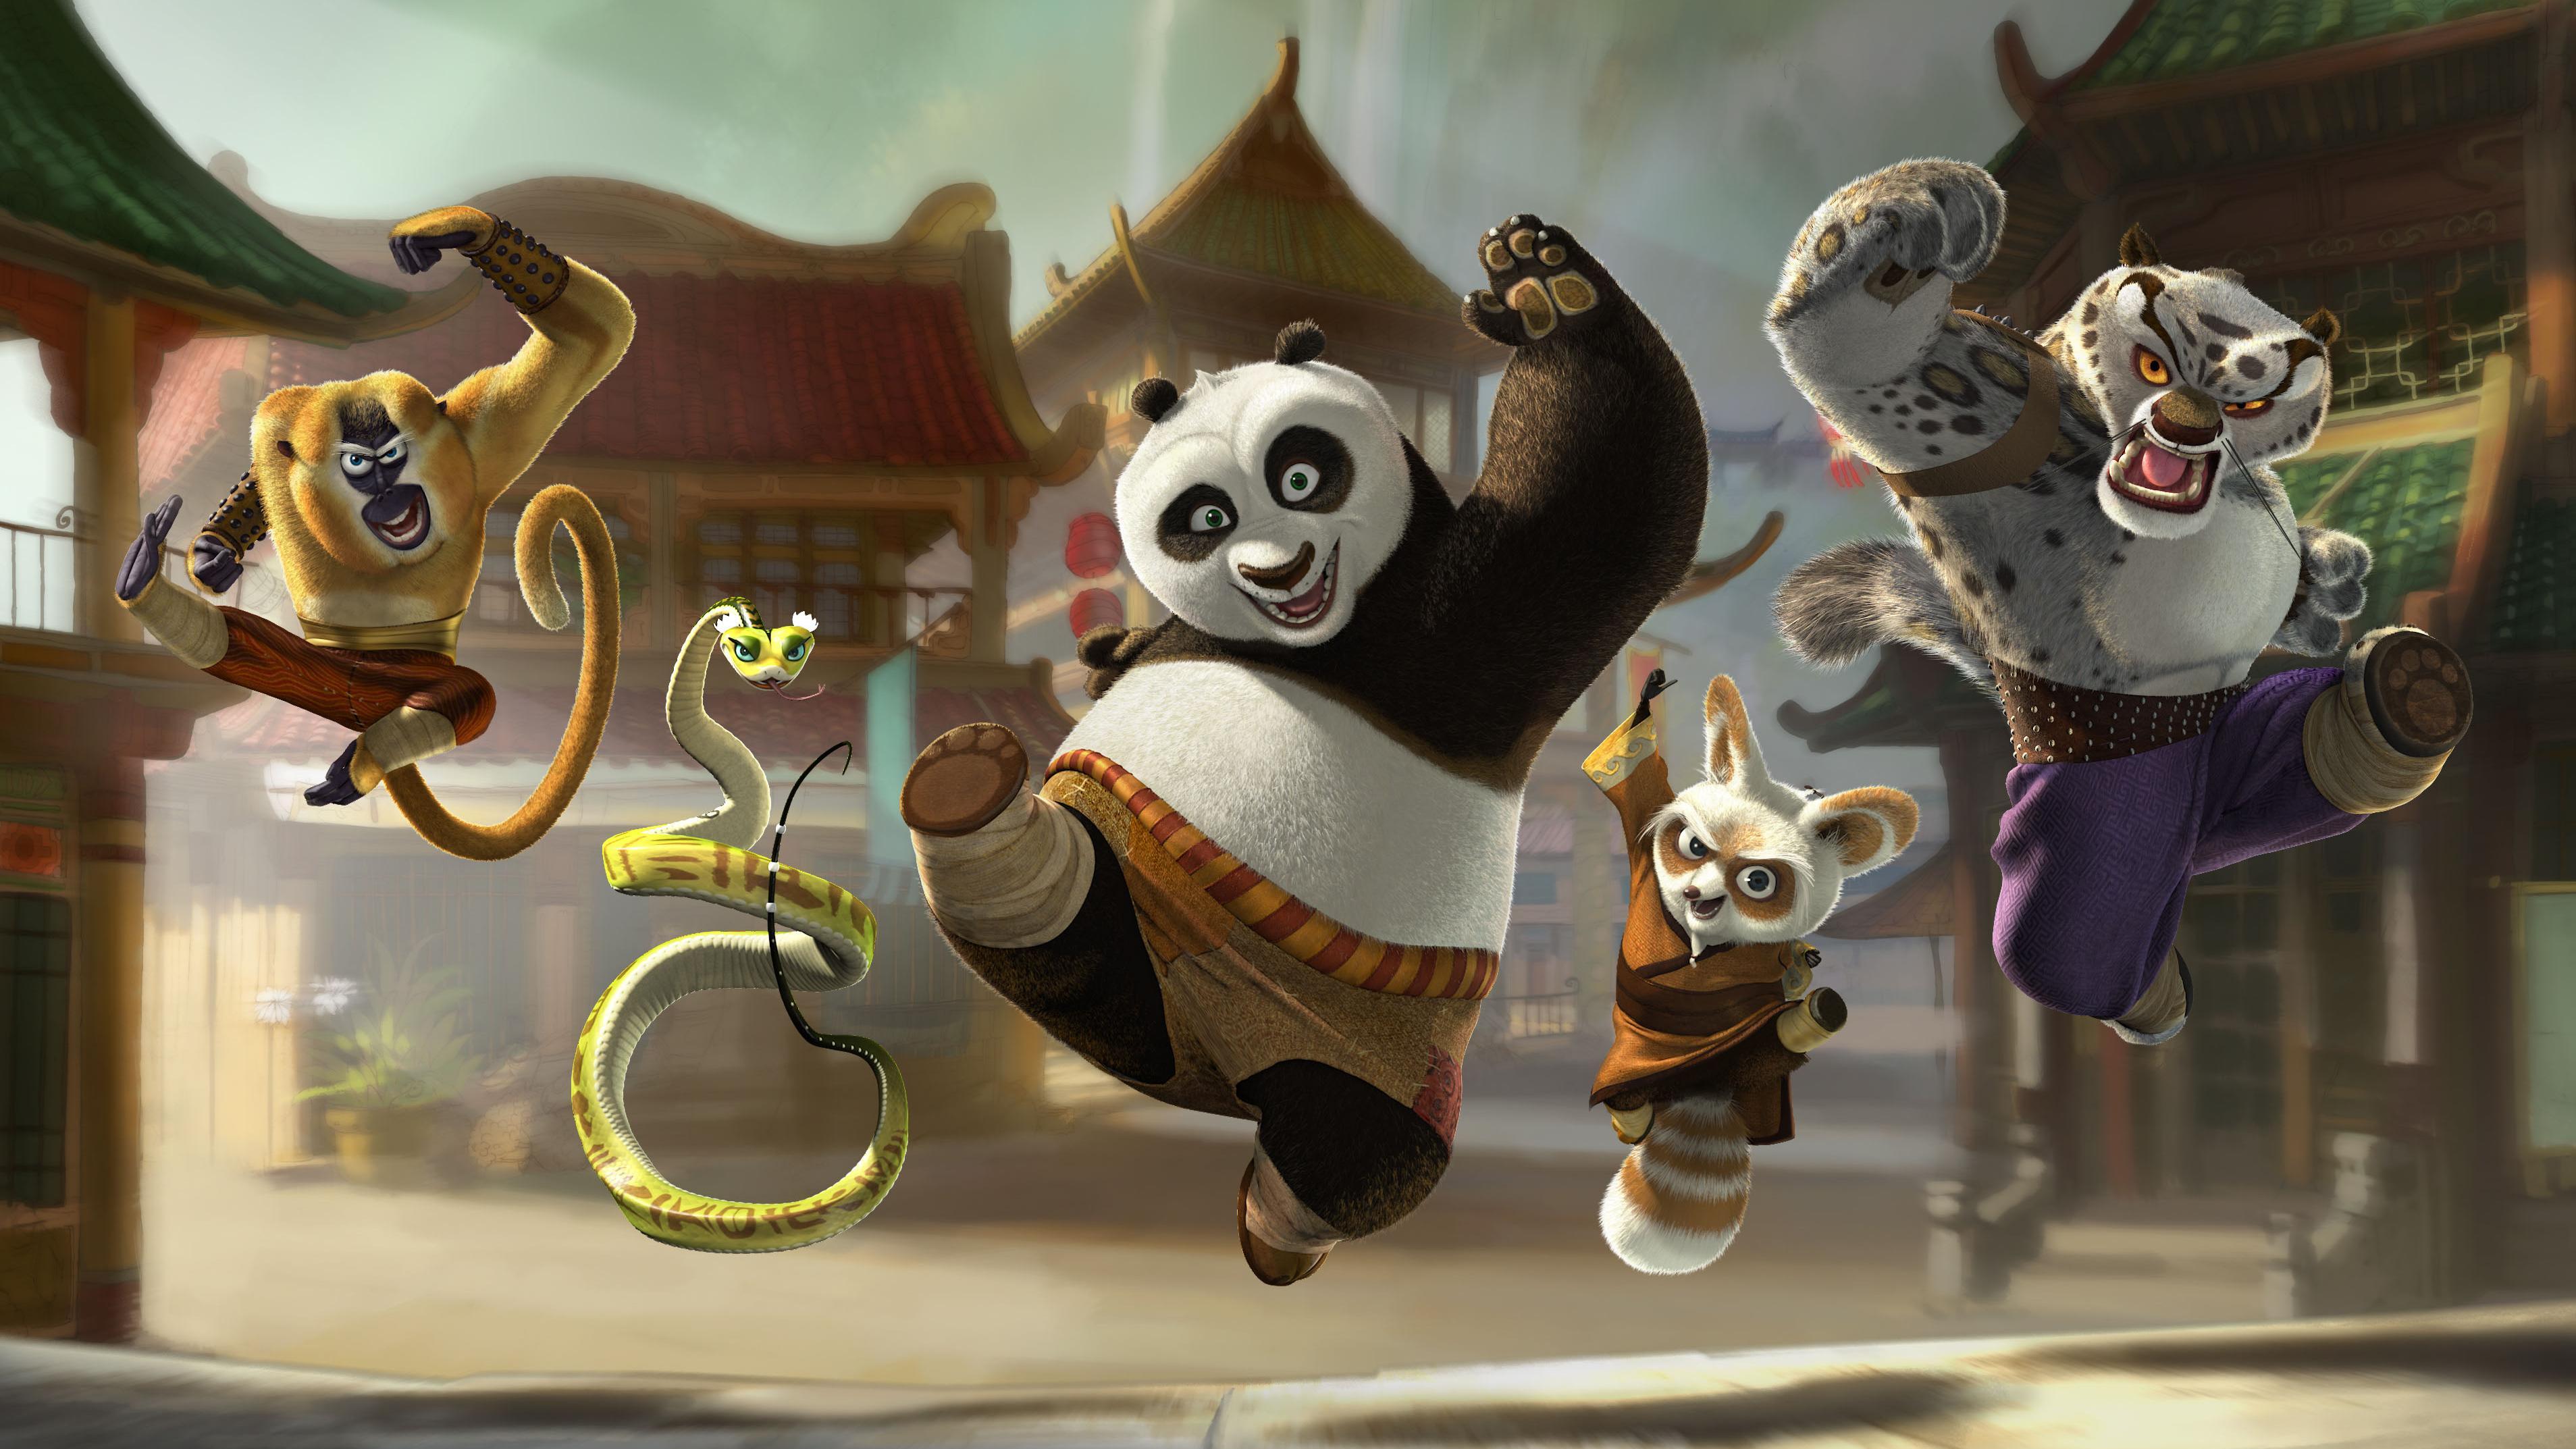 Tredimensjonal panda-action